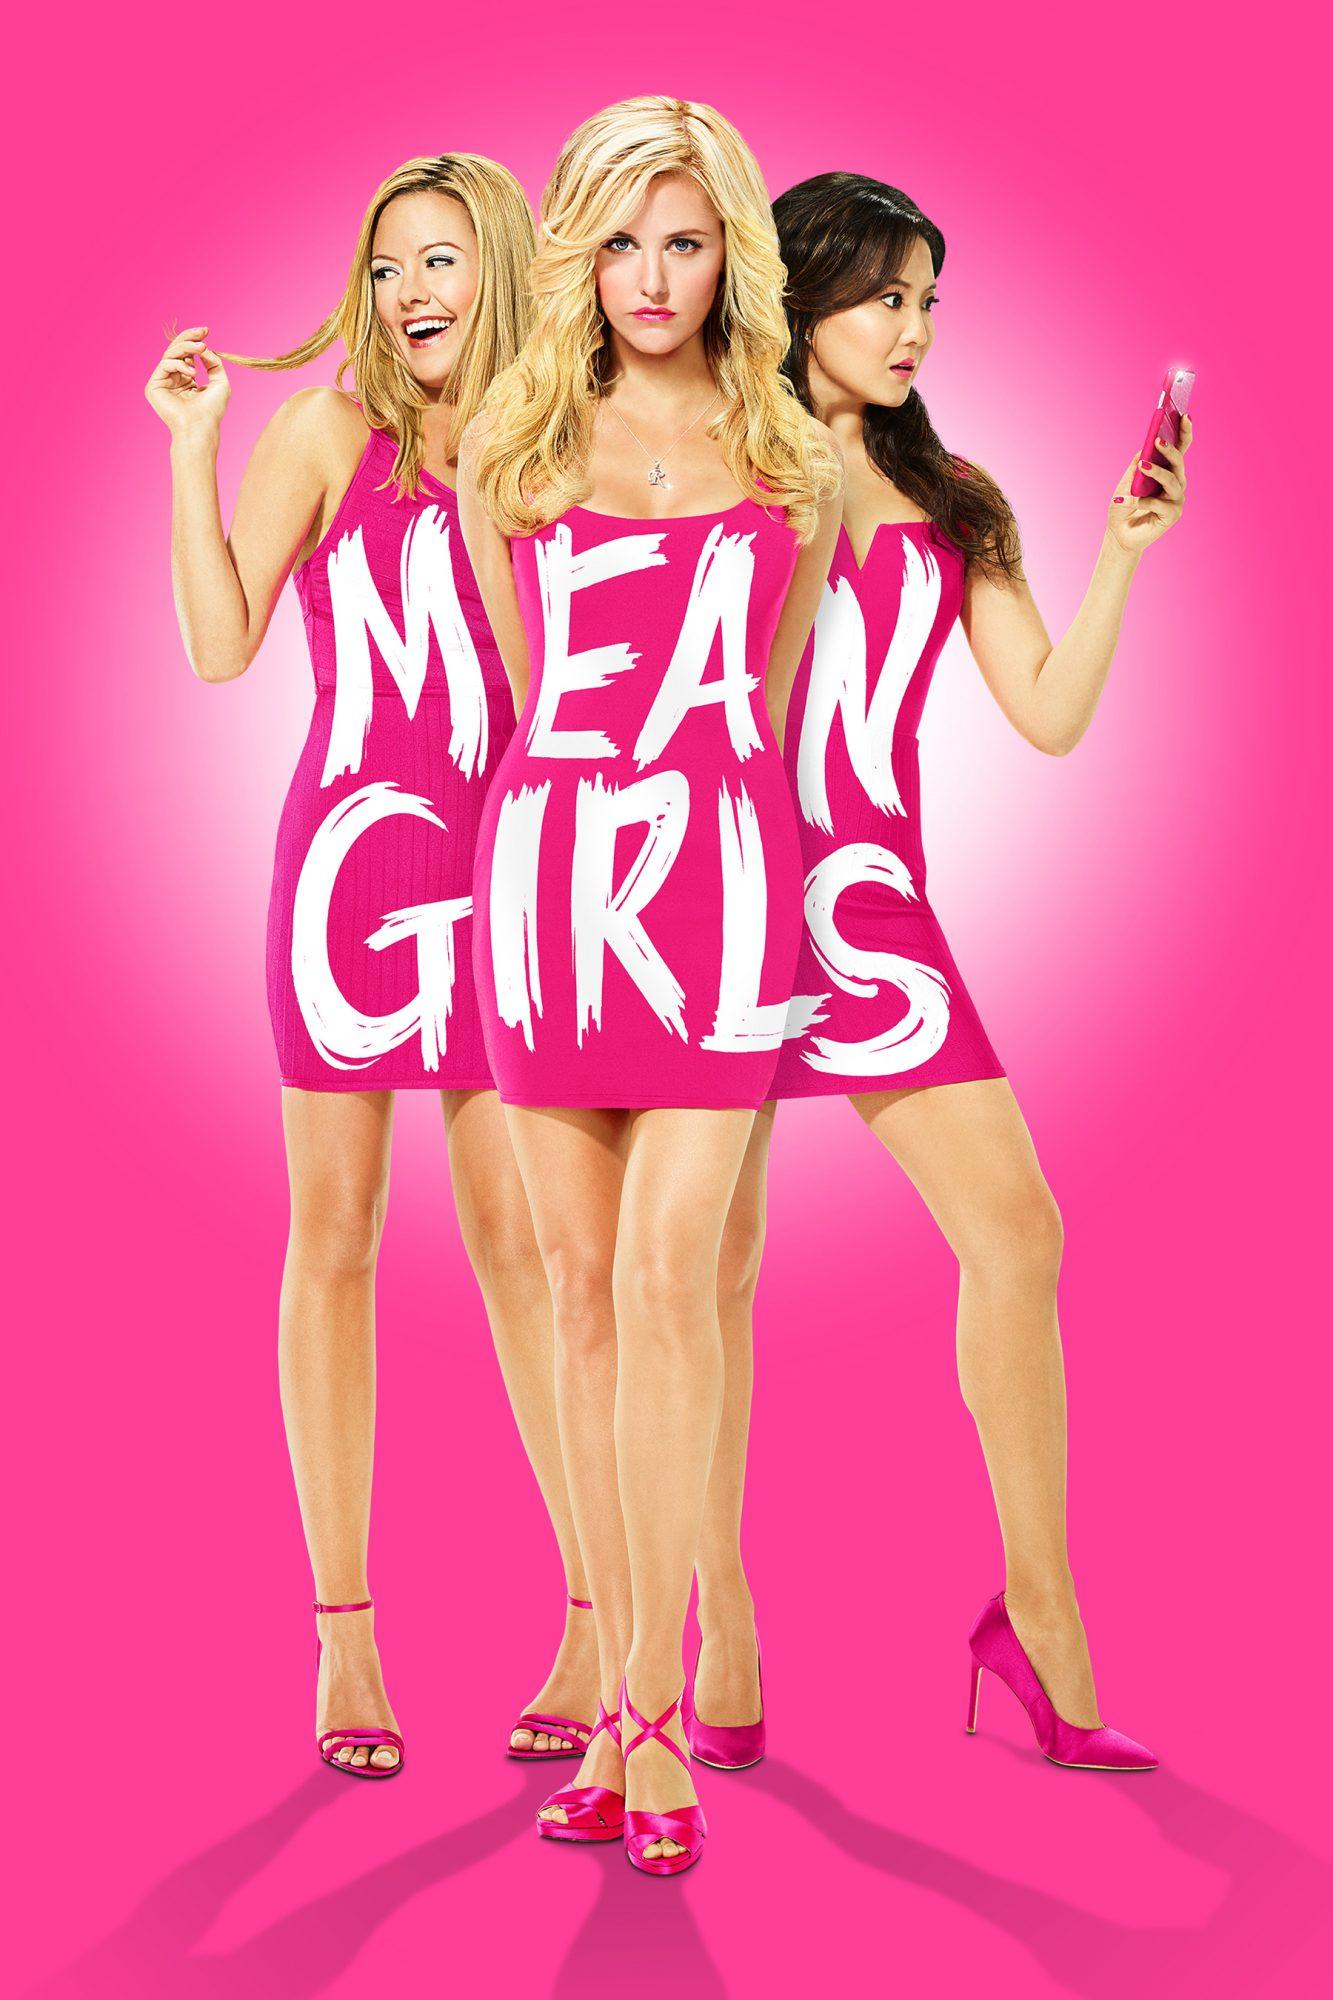 MEAN-GIRLS-Key-Art-No-Billing-Tight_Captioned